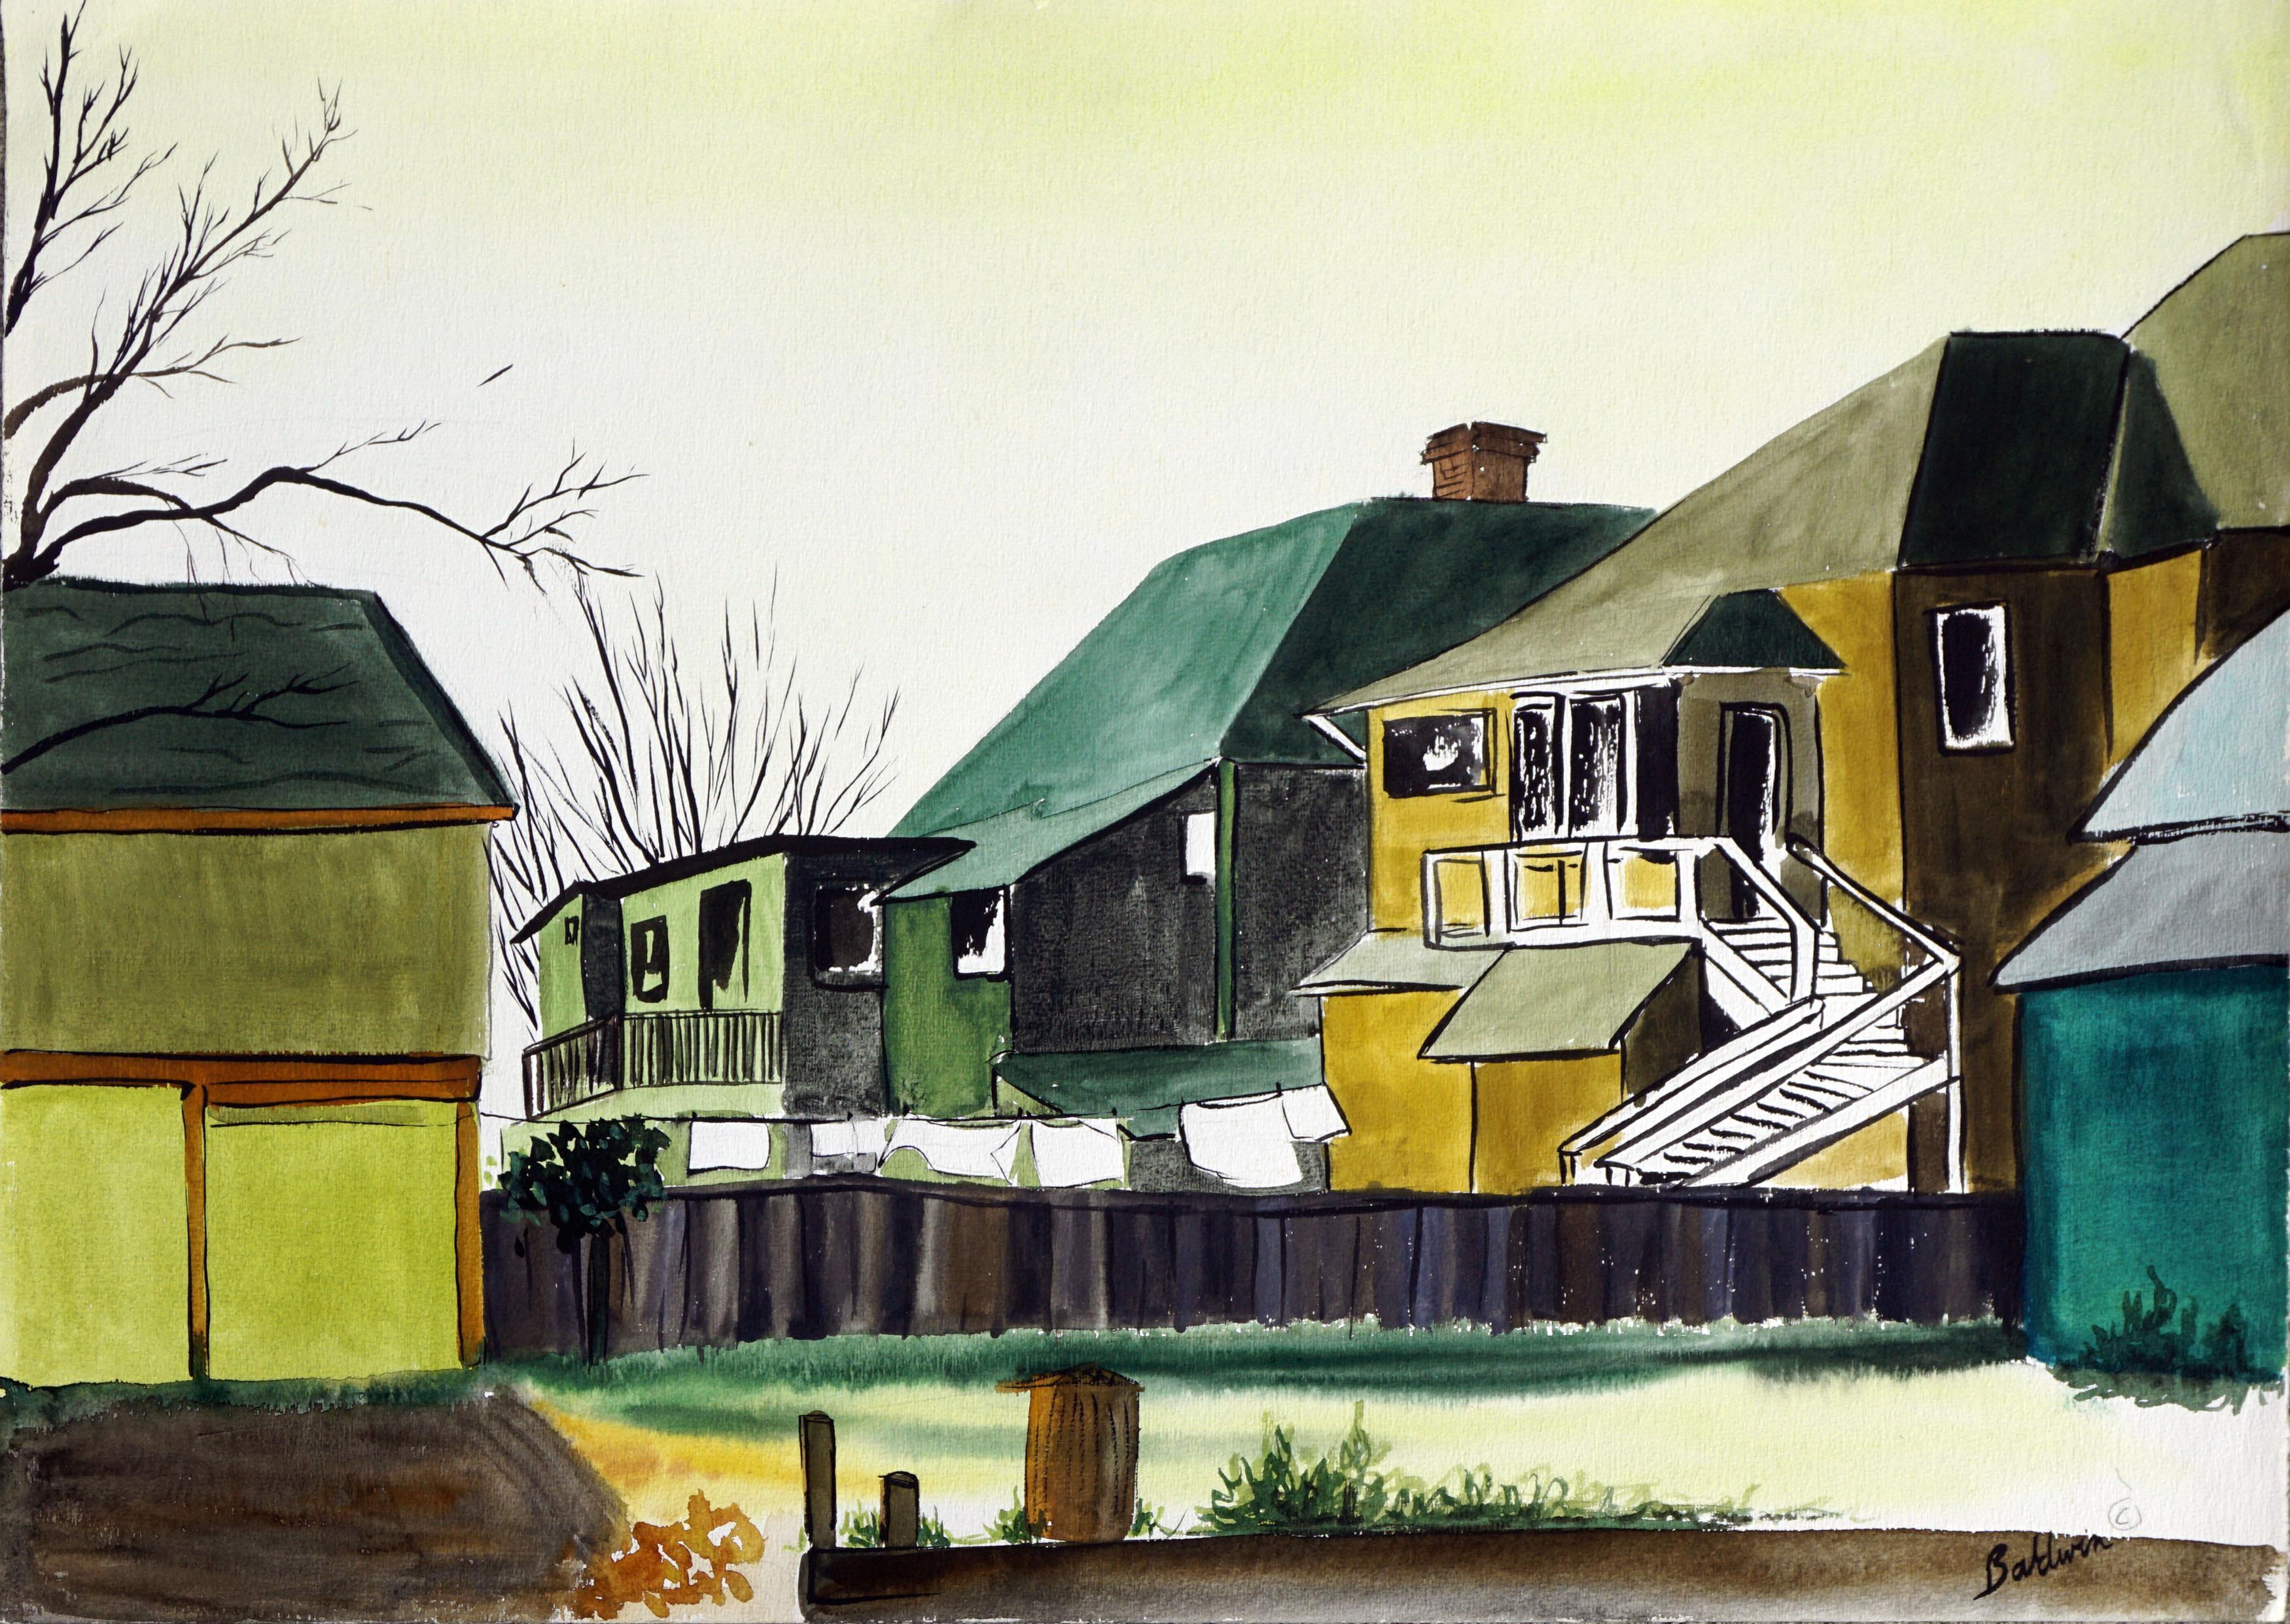 Modernist Suburban Neighborhood